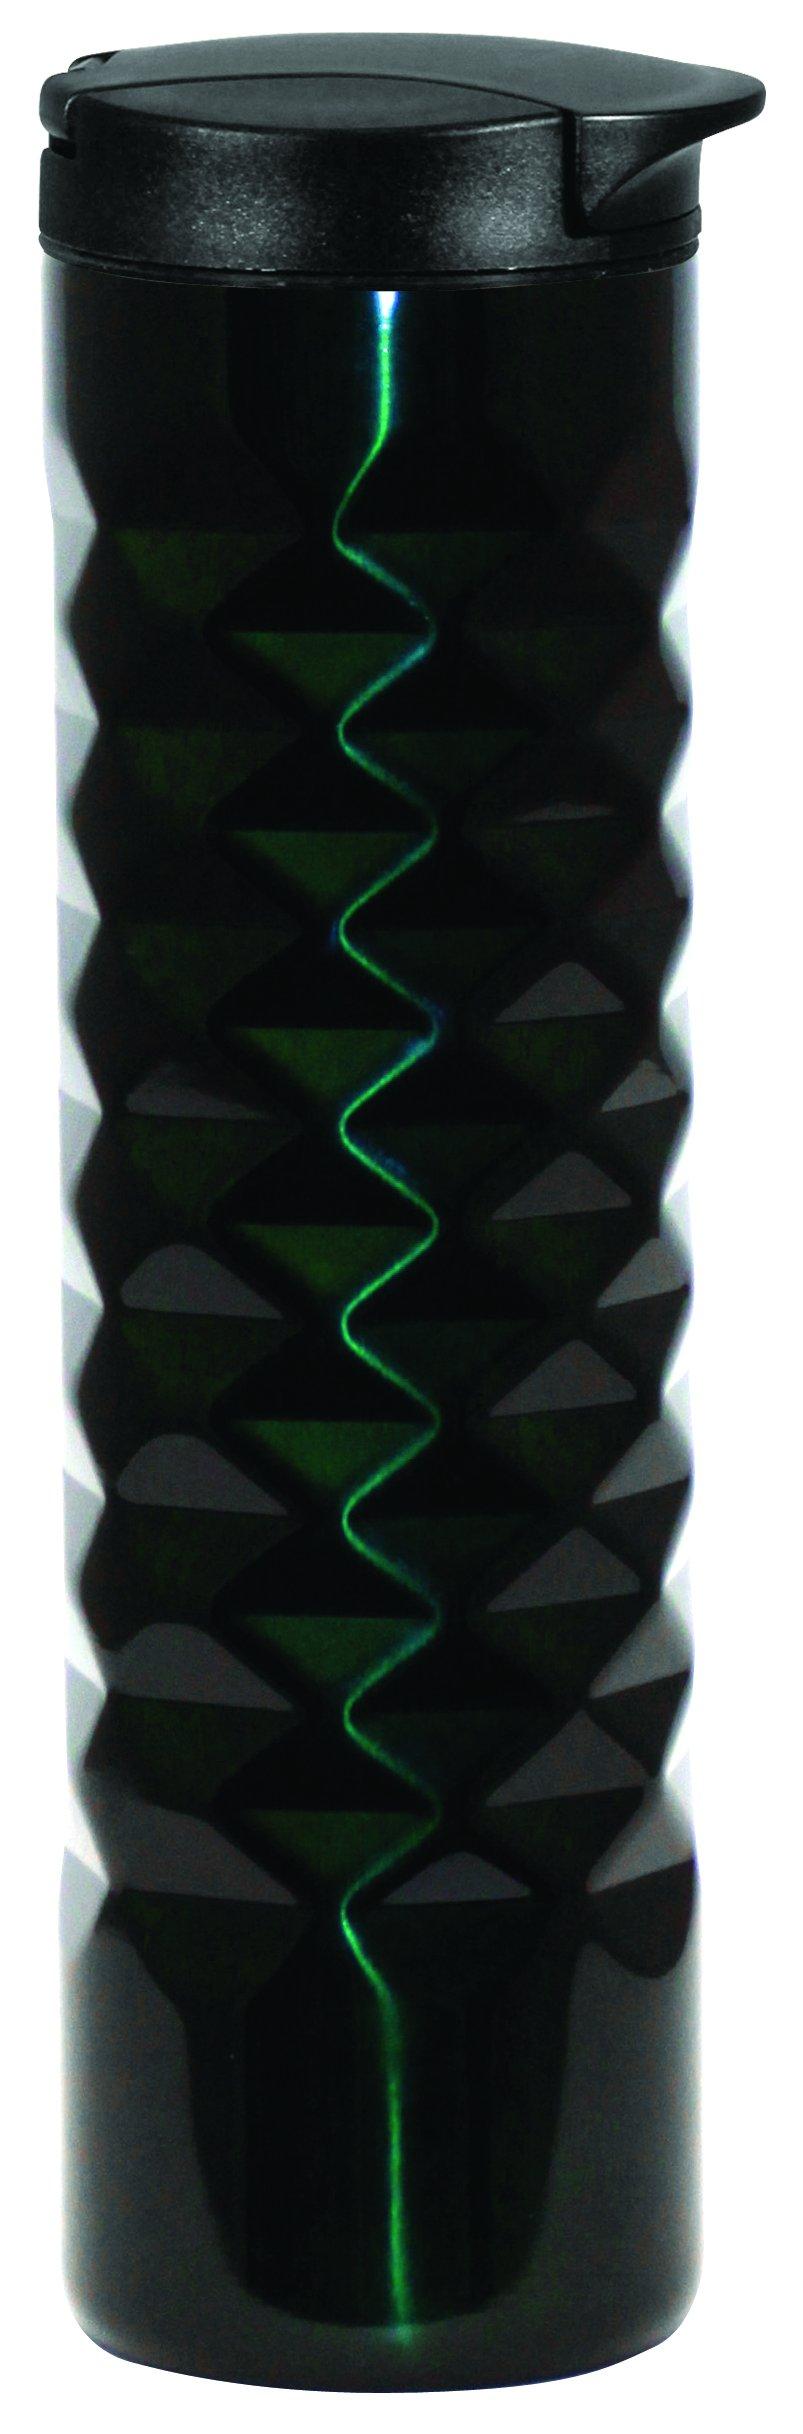 Green Canteen DWCM-7001-HG Stainless Steel Double Wall Coffee Mug with Diamond Design, 16 oz, Hunter Green